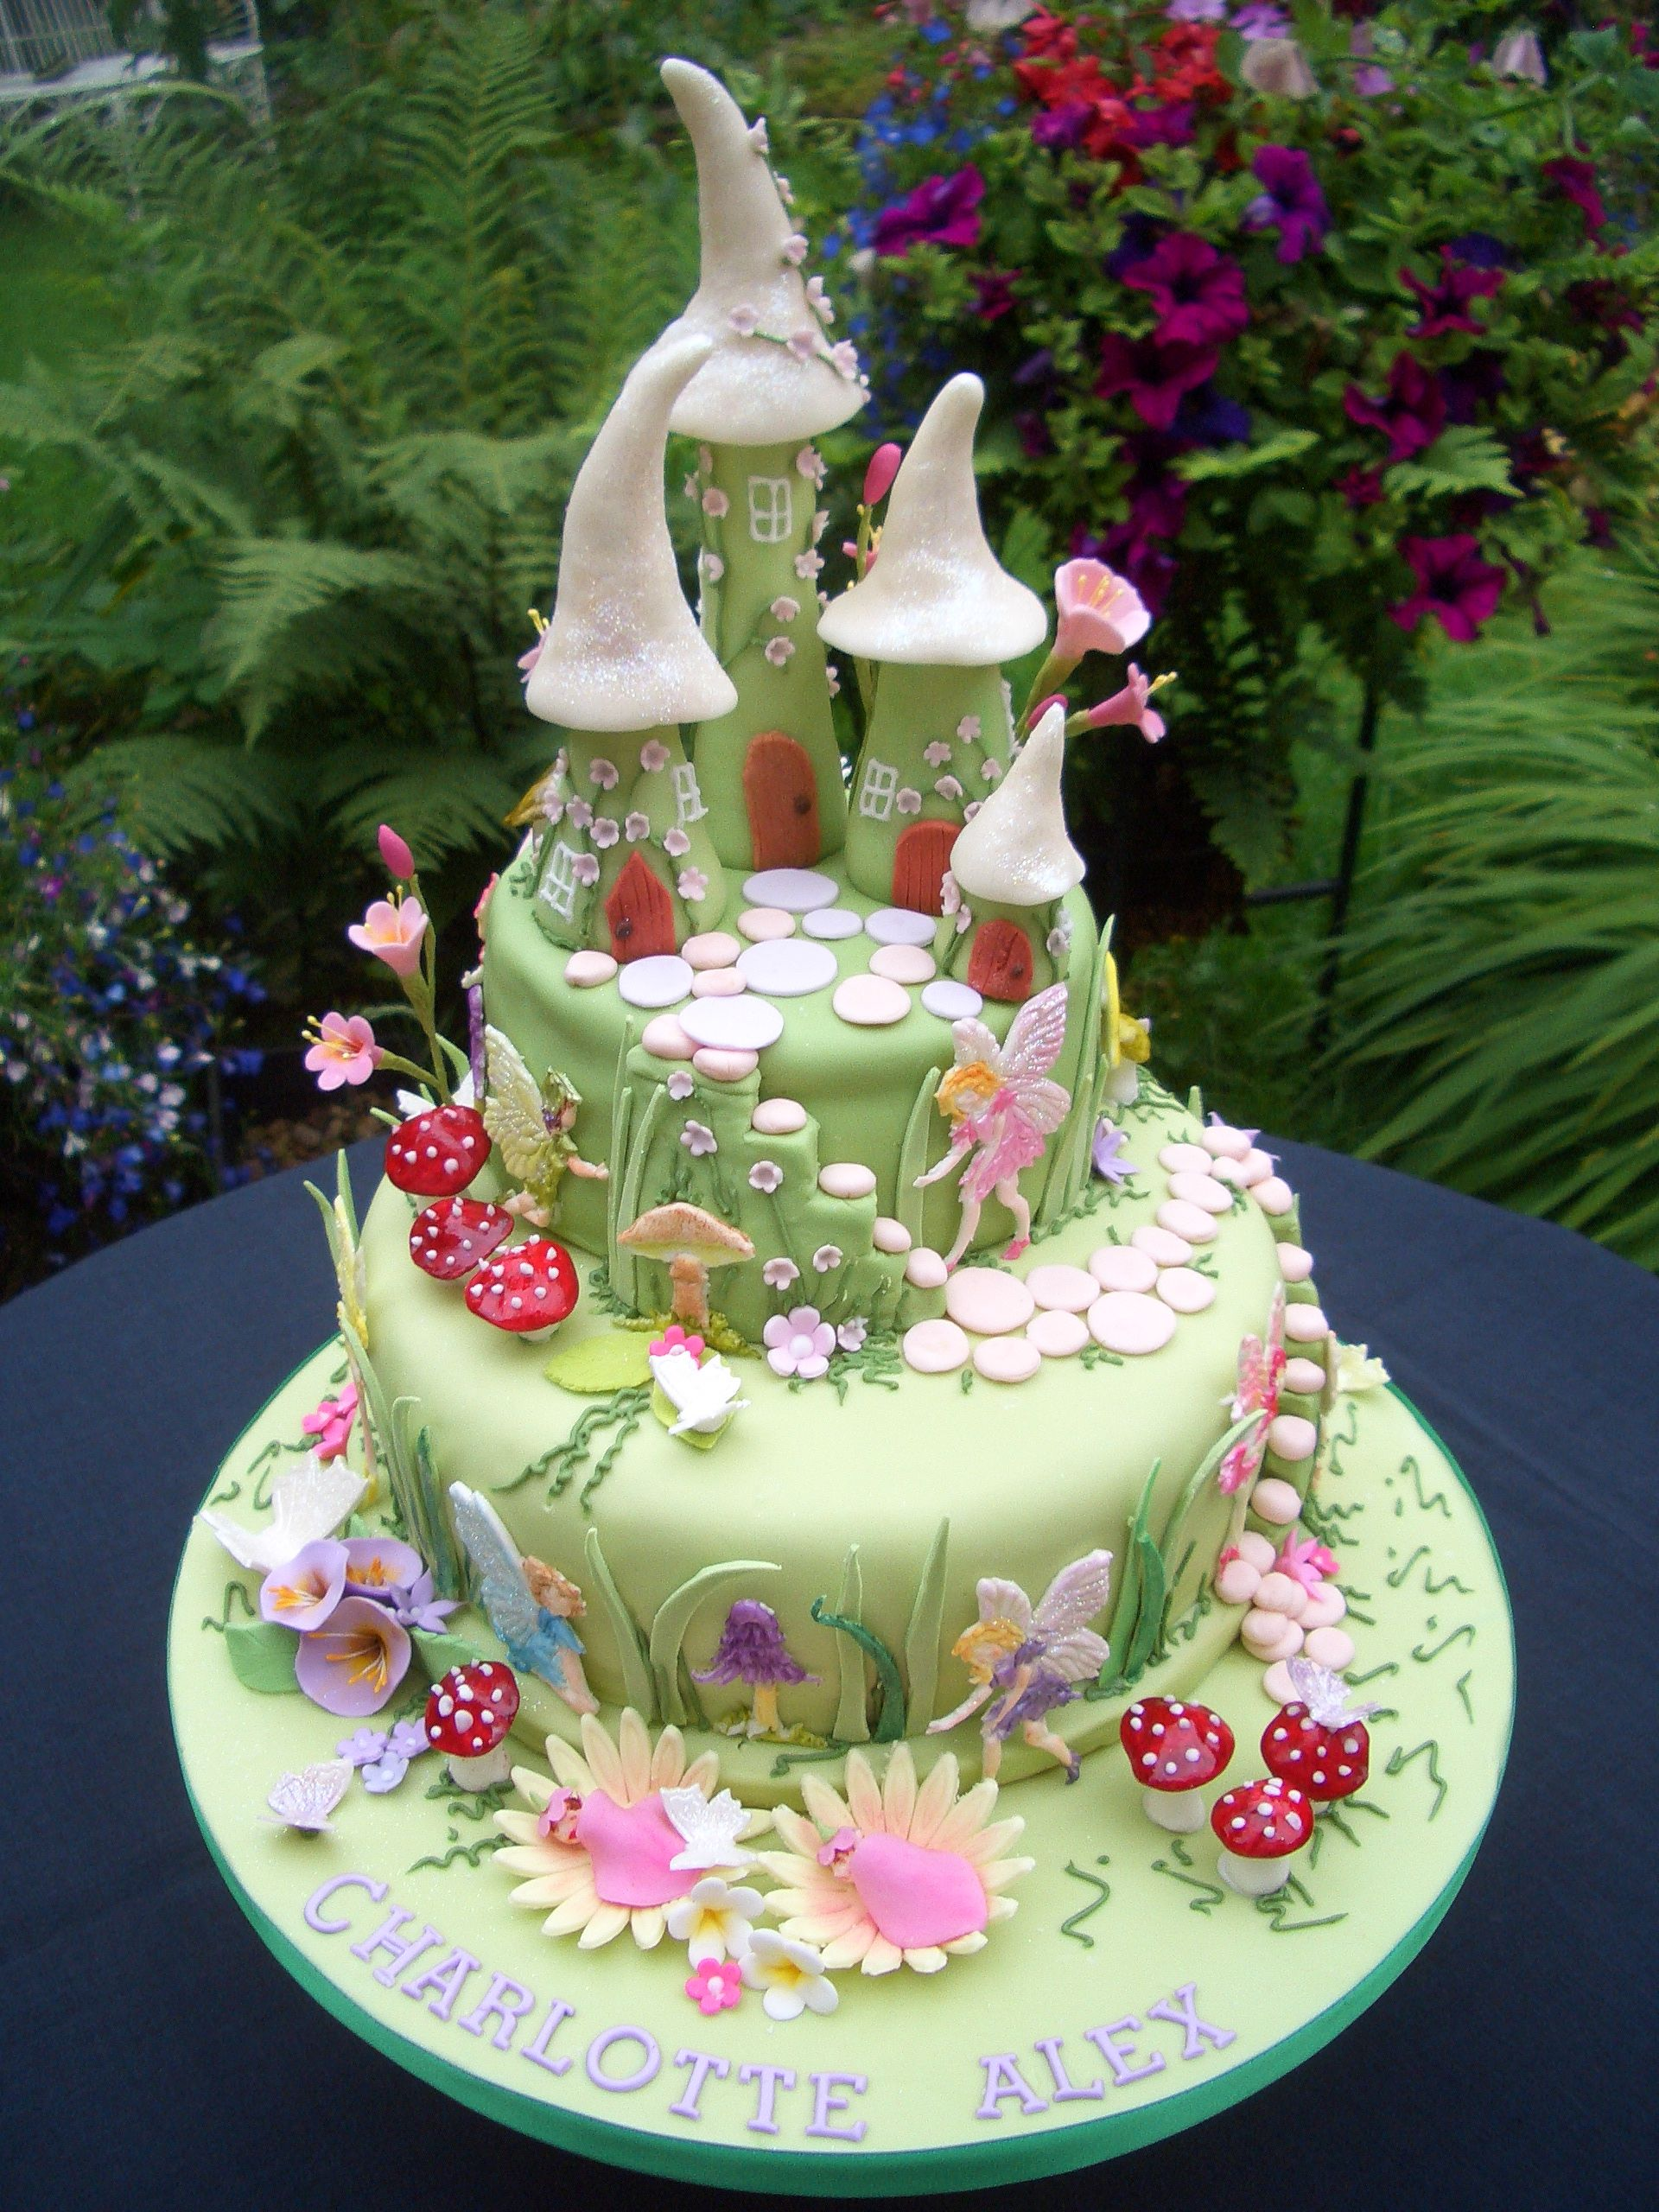 fairy house cake by pats cakes food art pinterest kuchen geburtstag torte und. Black Bedroom Furniture Sets. Home Design Ideas